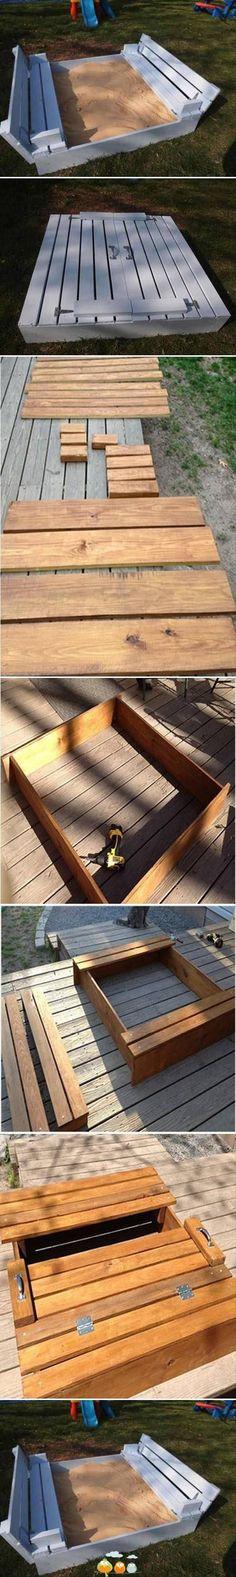 f r kinder 9 coole diy bastelideen mit holzpaletten pinteres. Black Bedroom Furniture Sets. Home Design Ideas